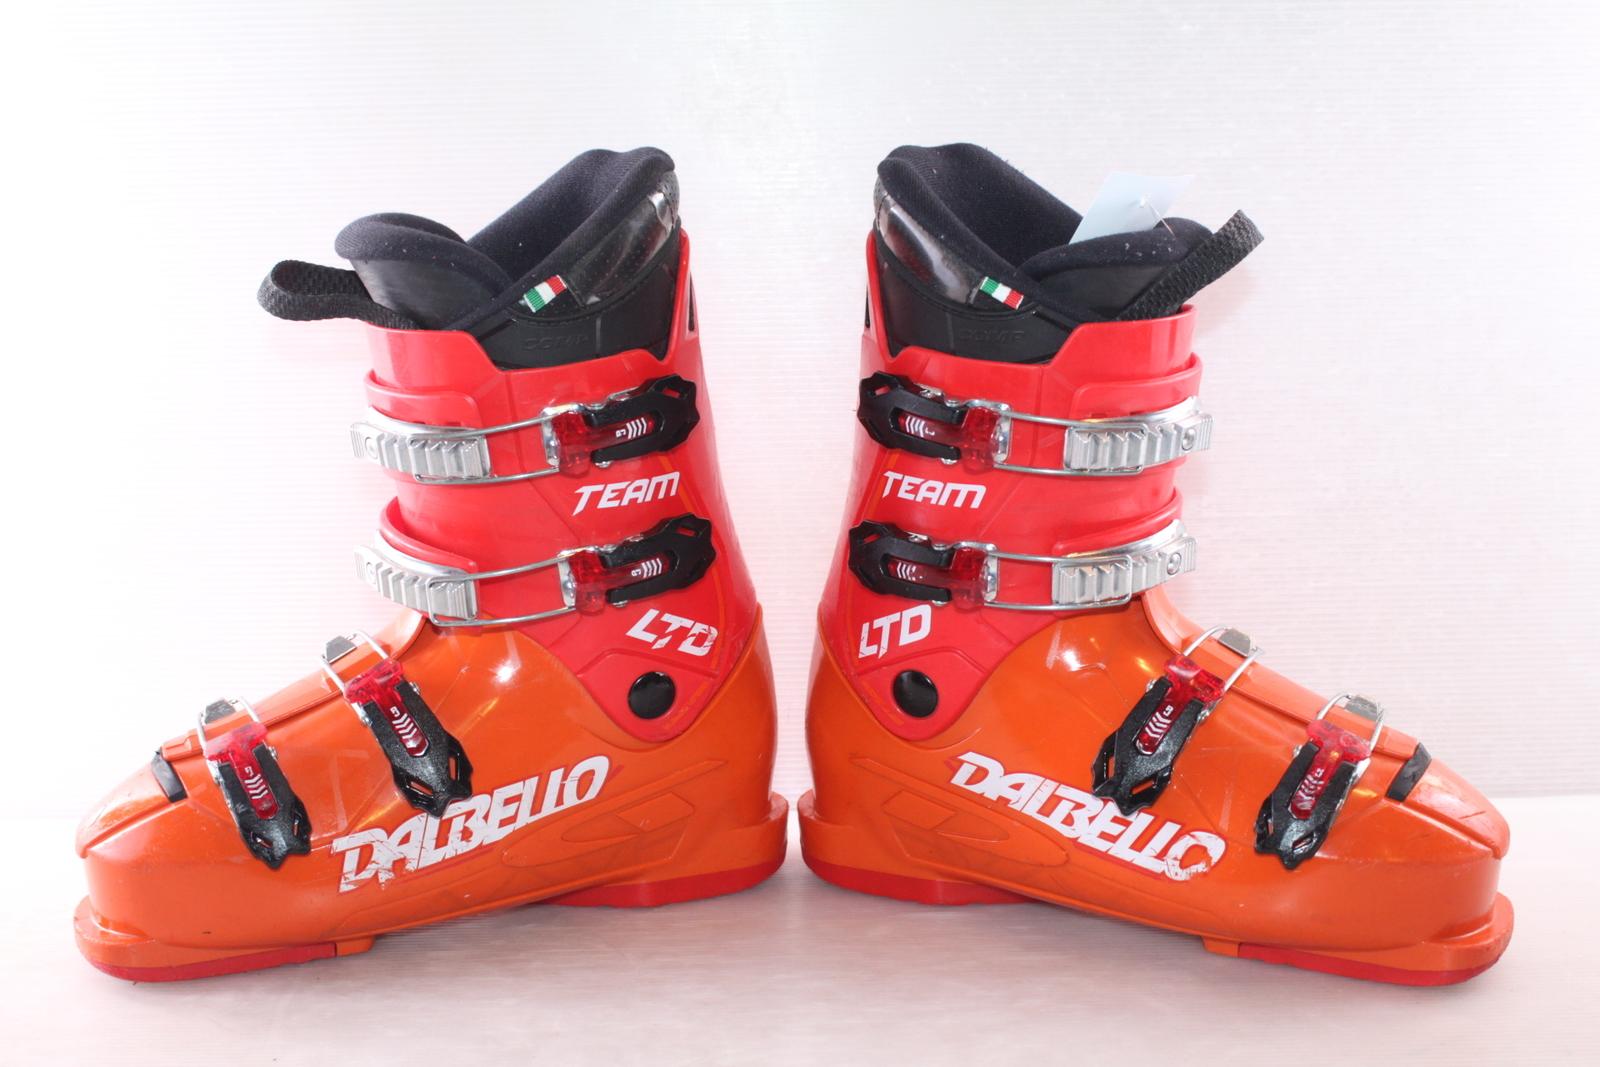 Dětské lyžáky Dalbello Team Ltd vel. EU39